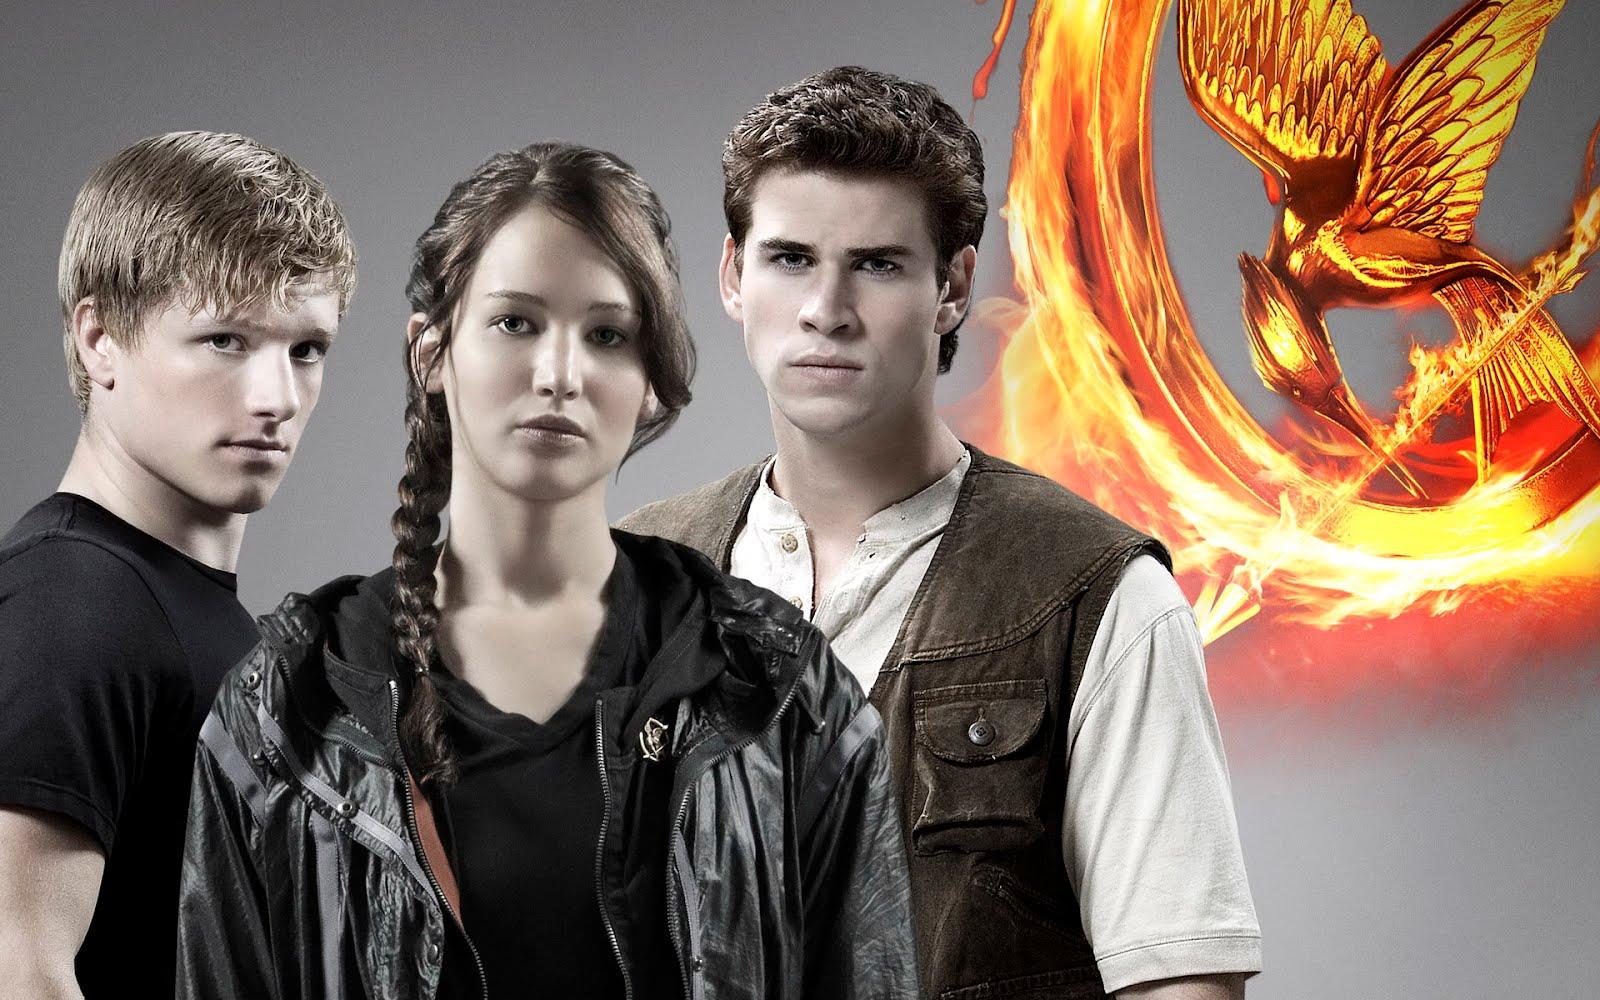 Swell Hairstyles Beauties The Hunger Games Hairstyles Short Hairstyles Gunalazisus